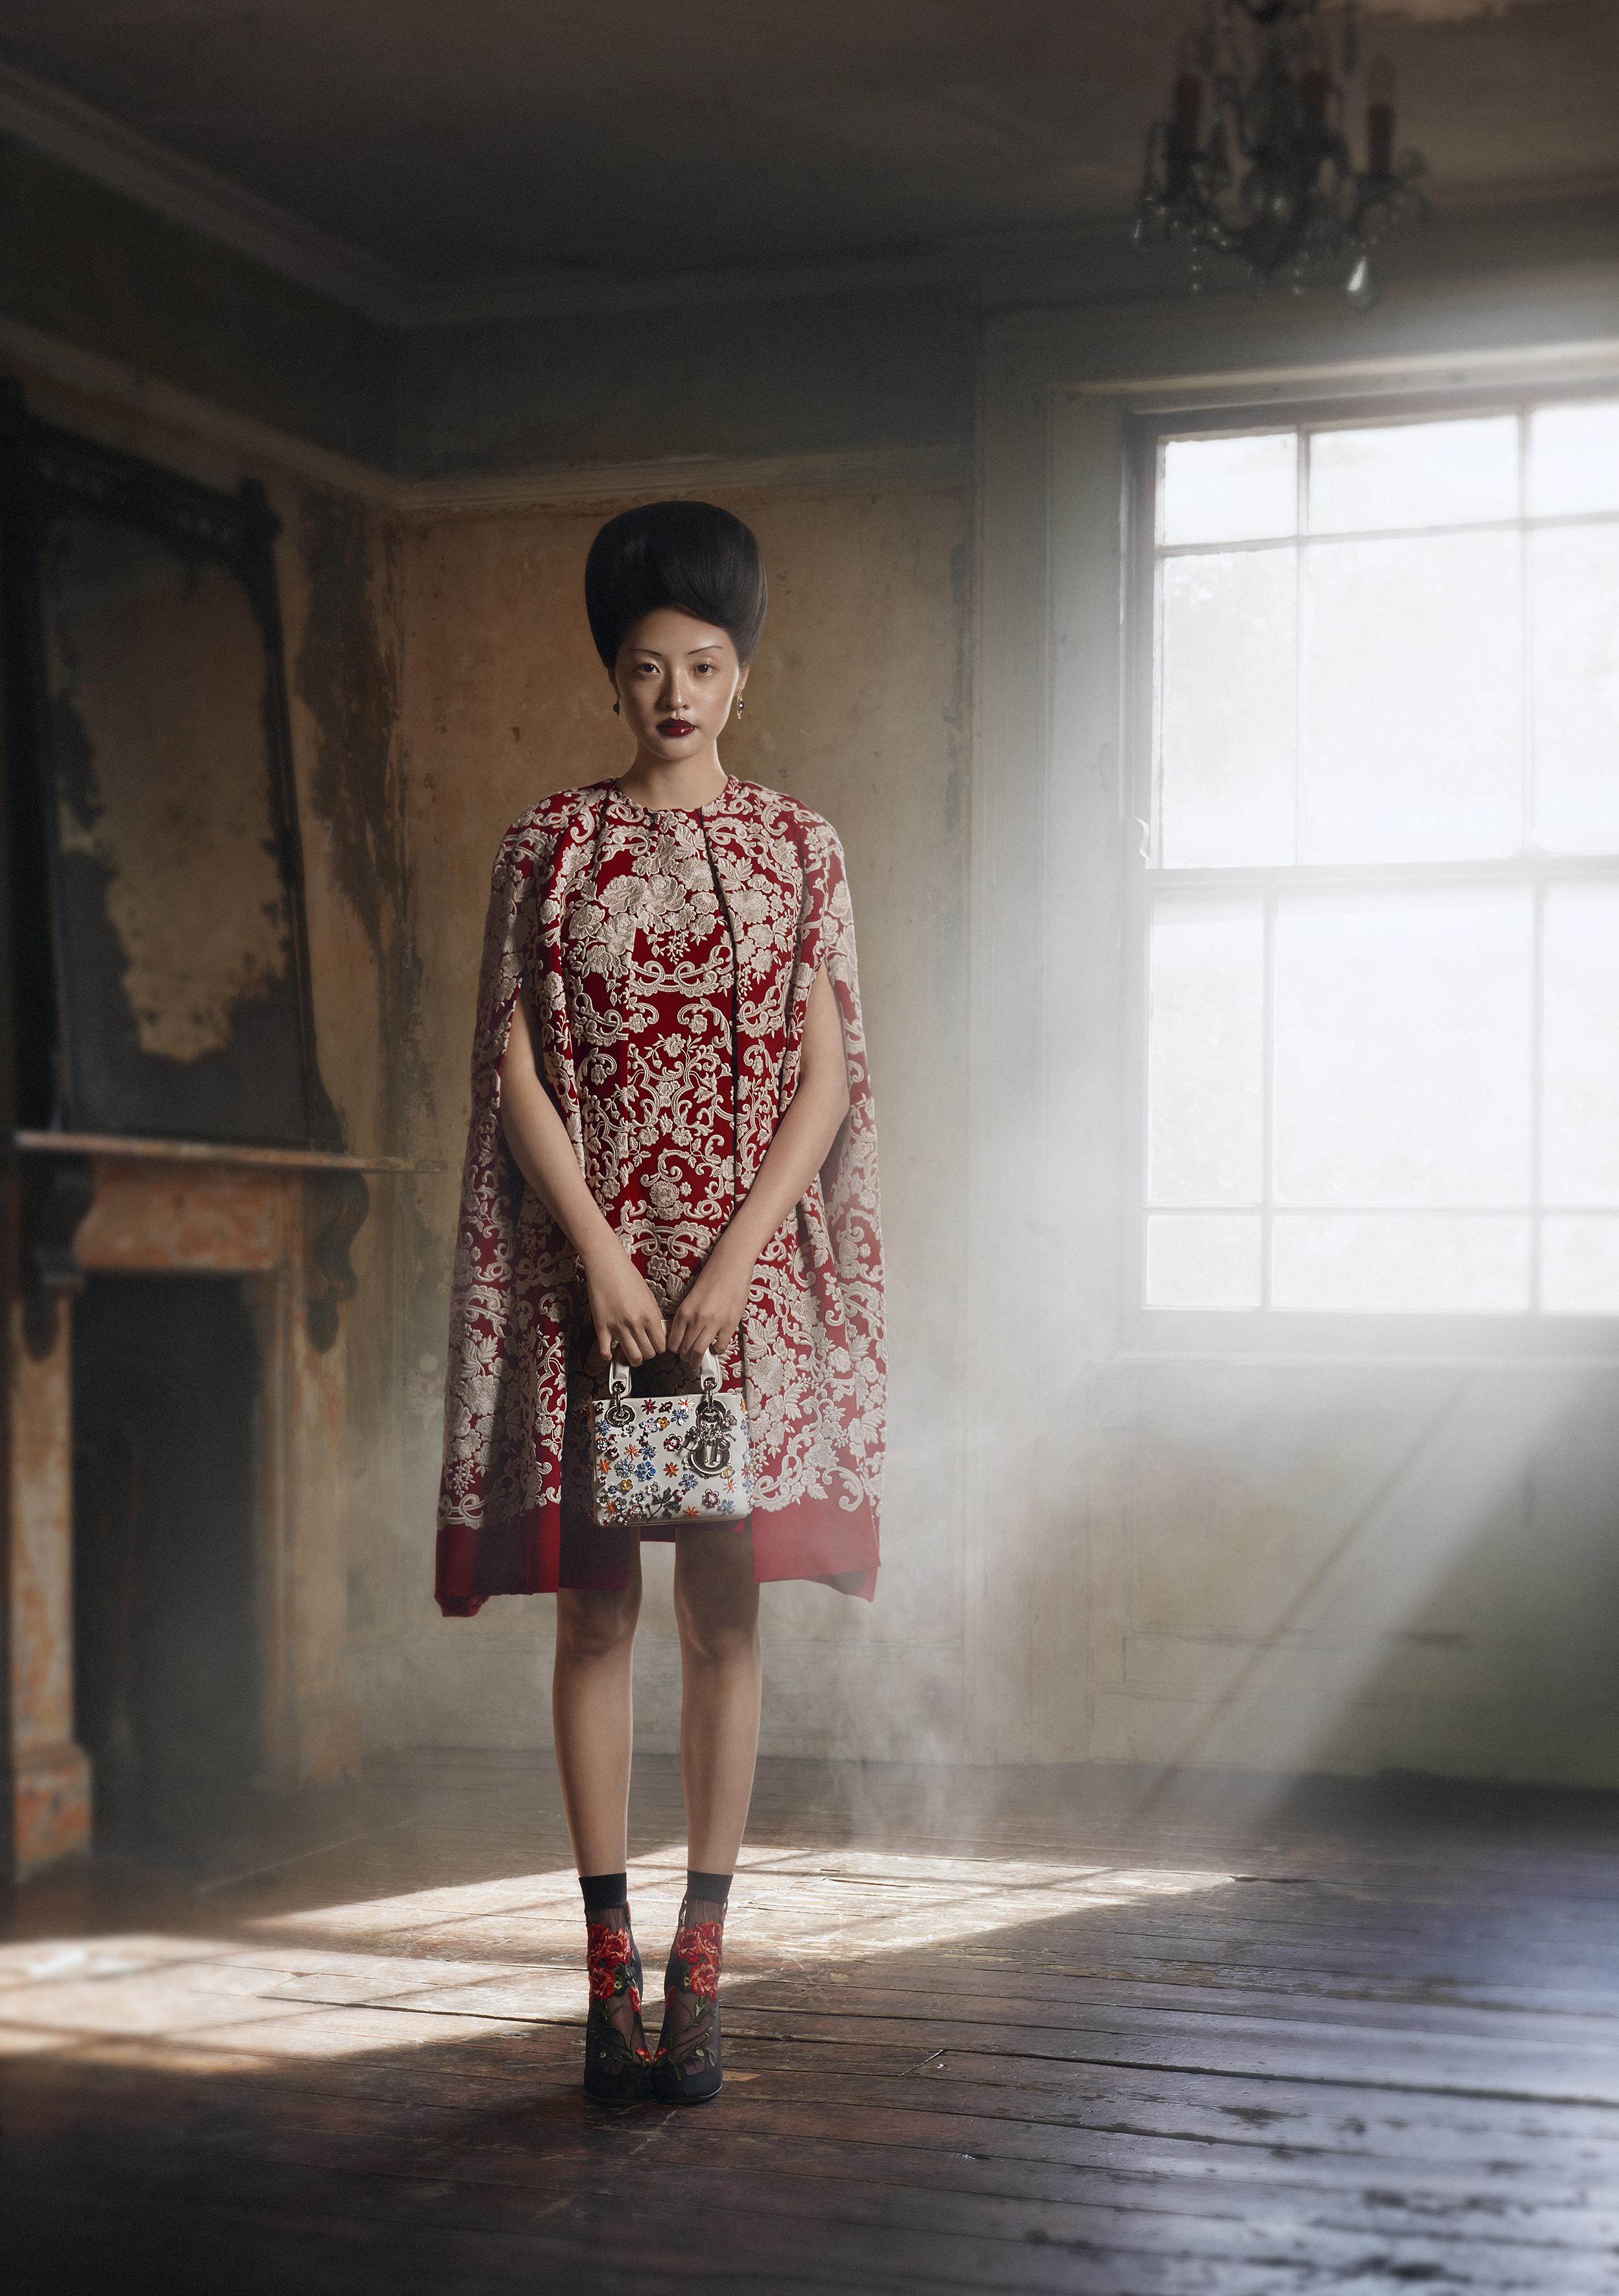 Dolce & Gabbana / Christian Dior / George McLeod / Luxure Magazine